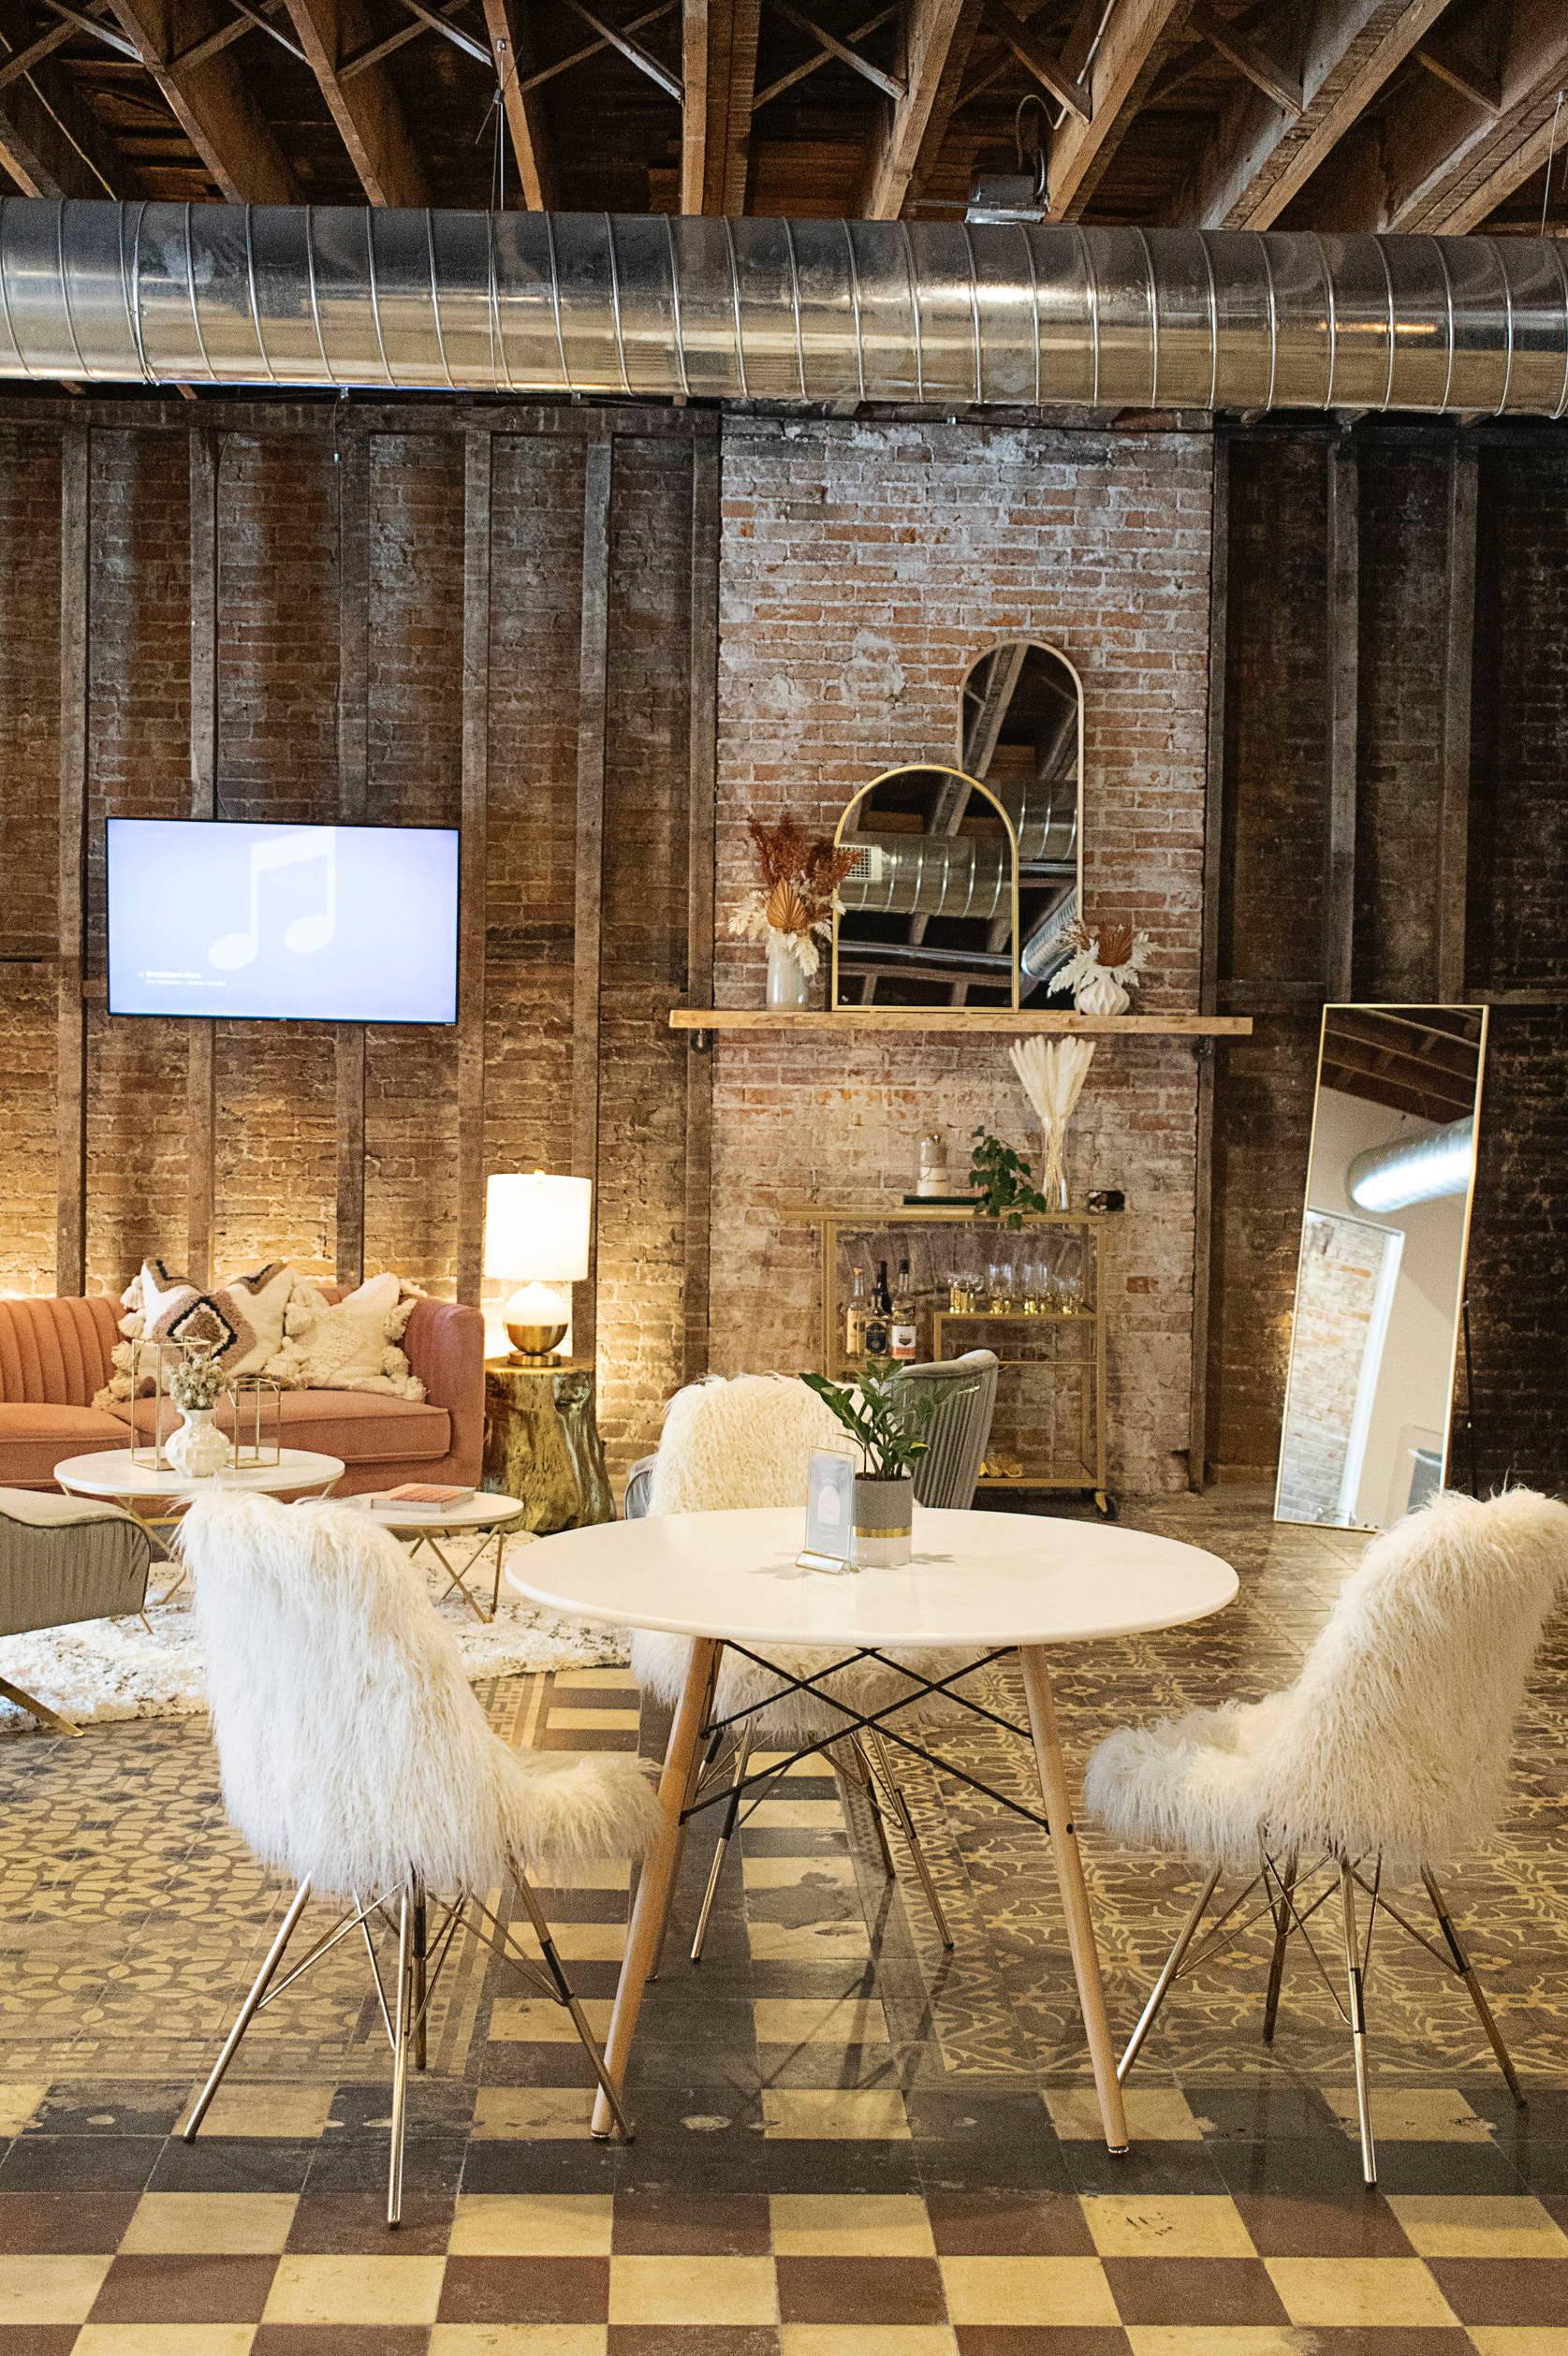 aesthetically pleasing workspaces in communal lounge